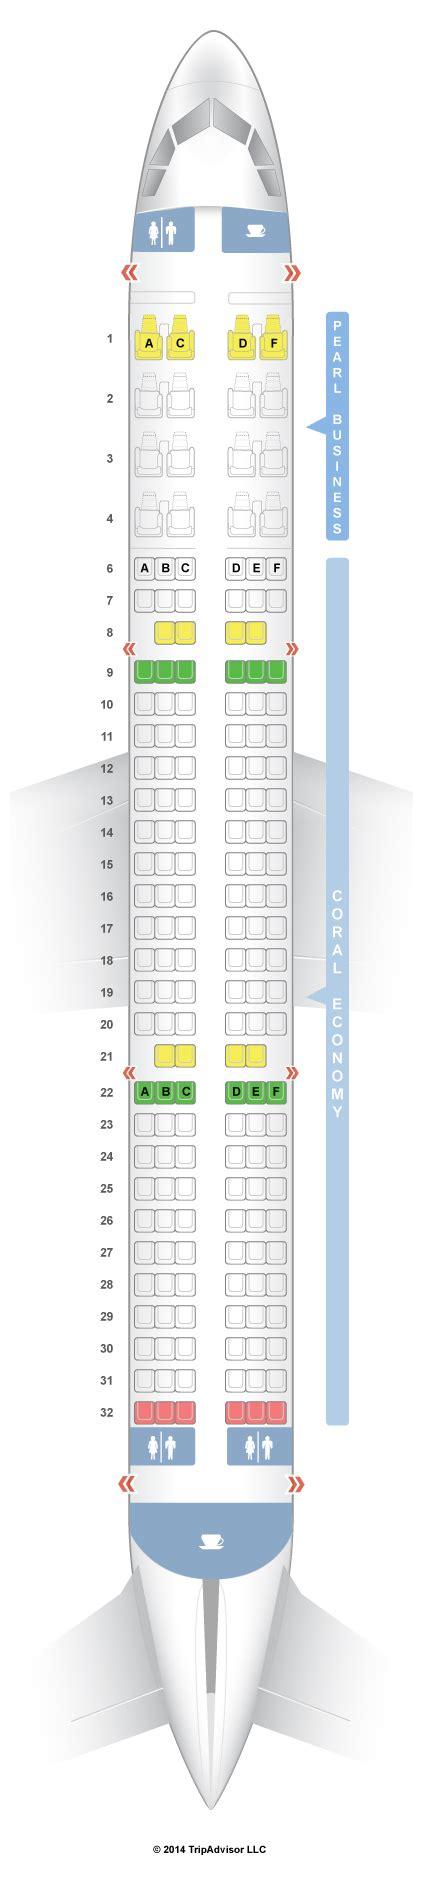 airbus a321 cabin layout seatguru seat map etihad airbus a321 321